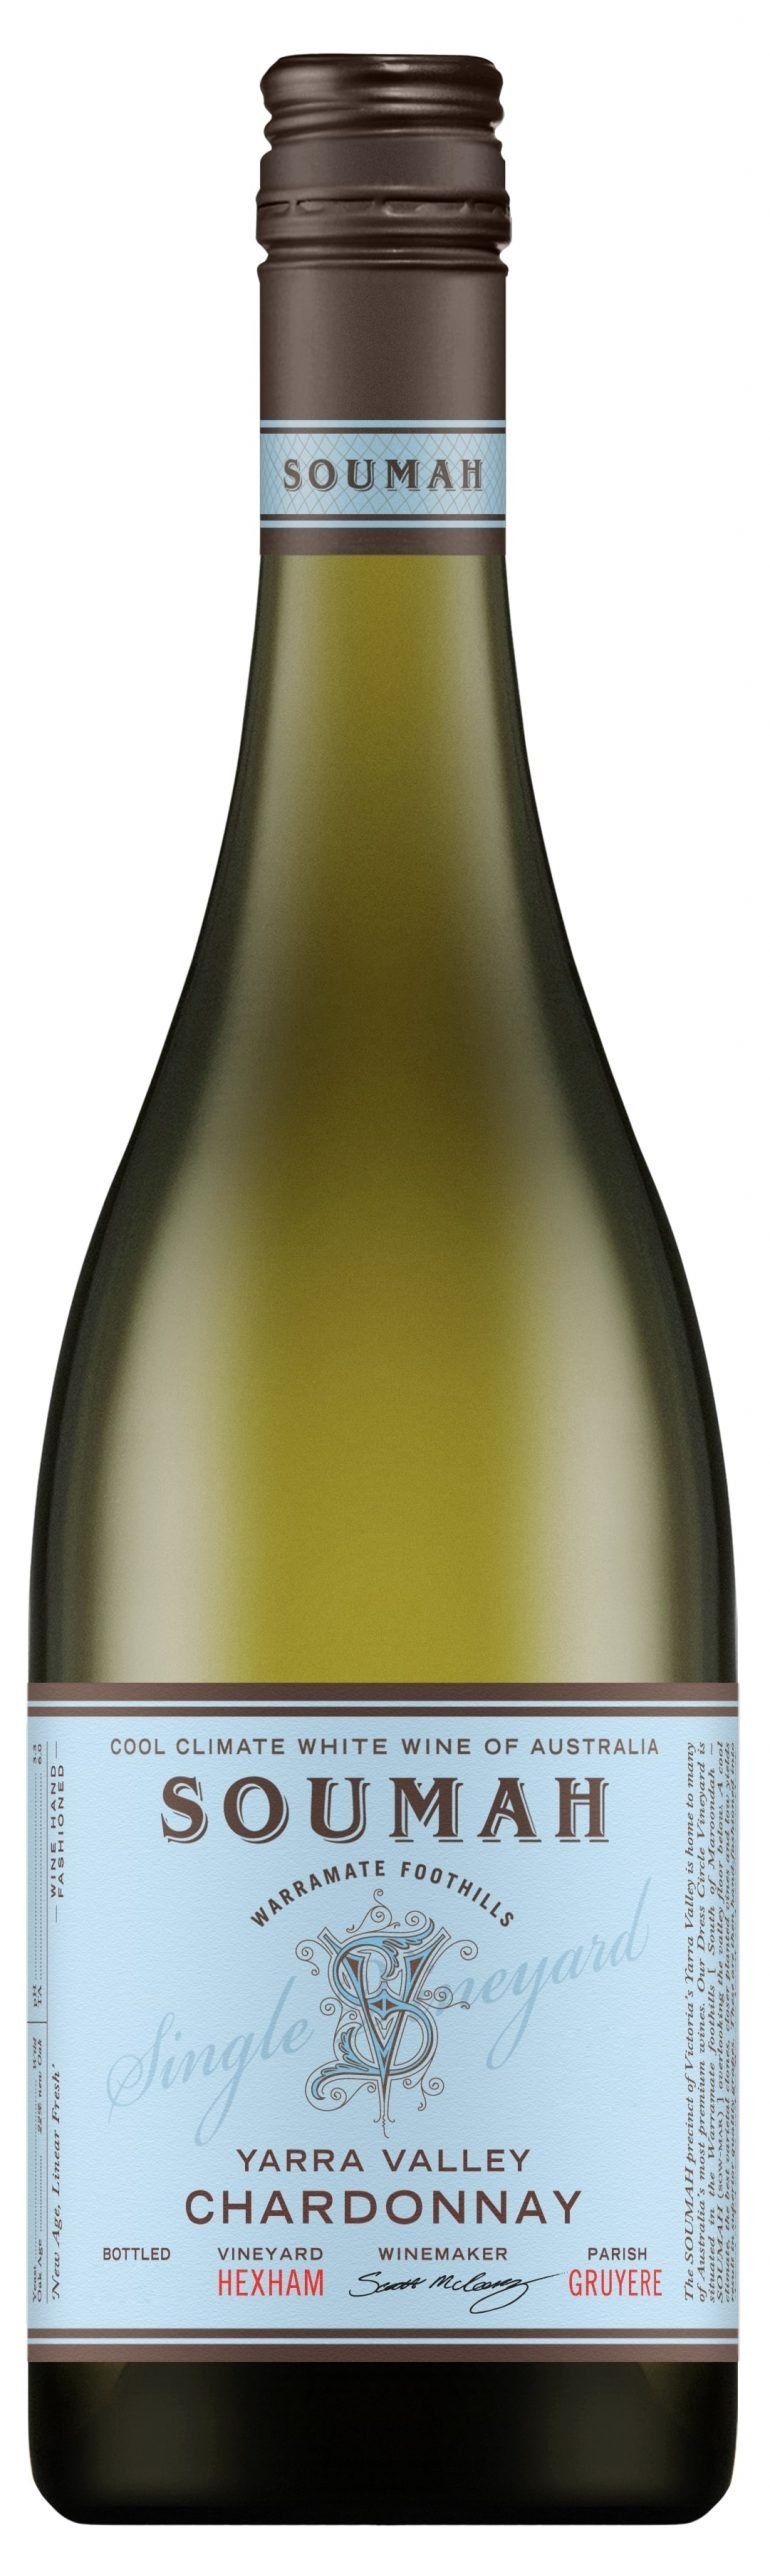 Soumah 'Hexam Vineyard' Chardonnay 2018-0